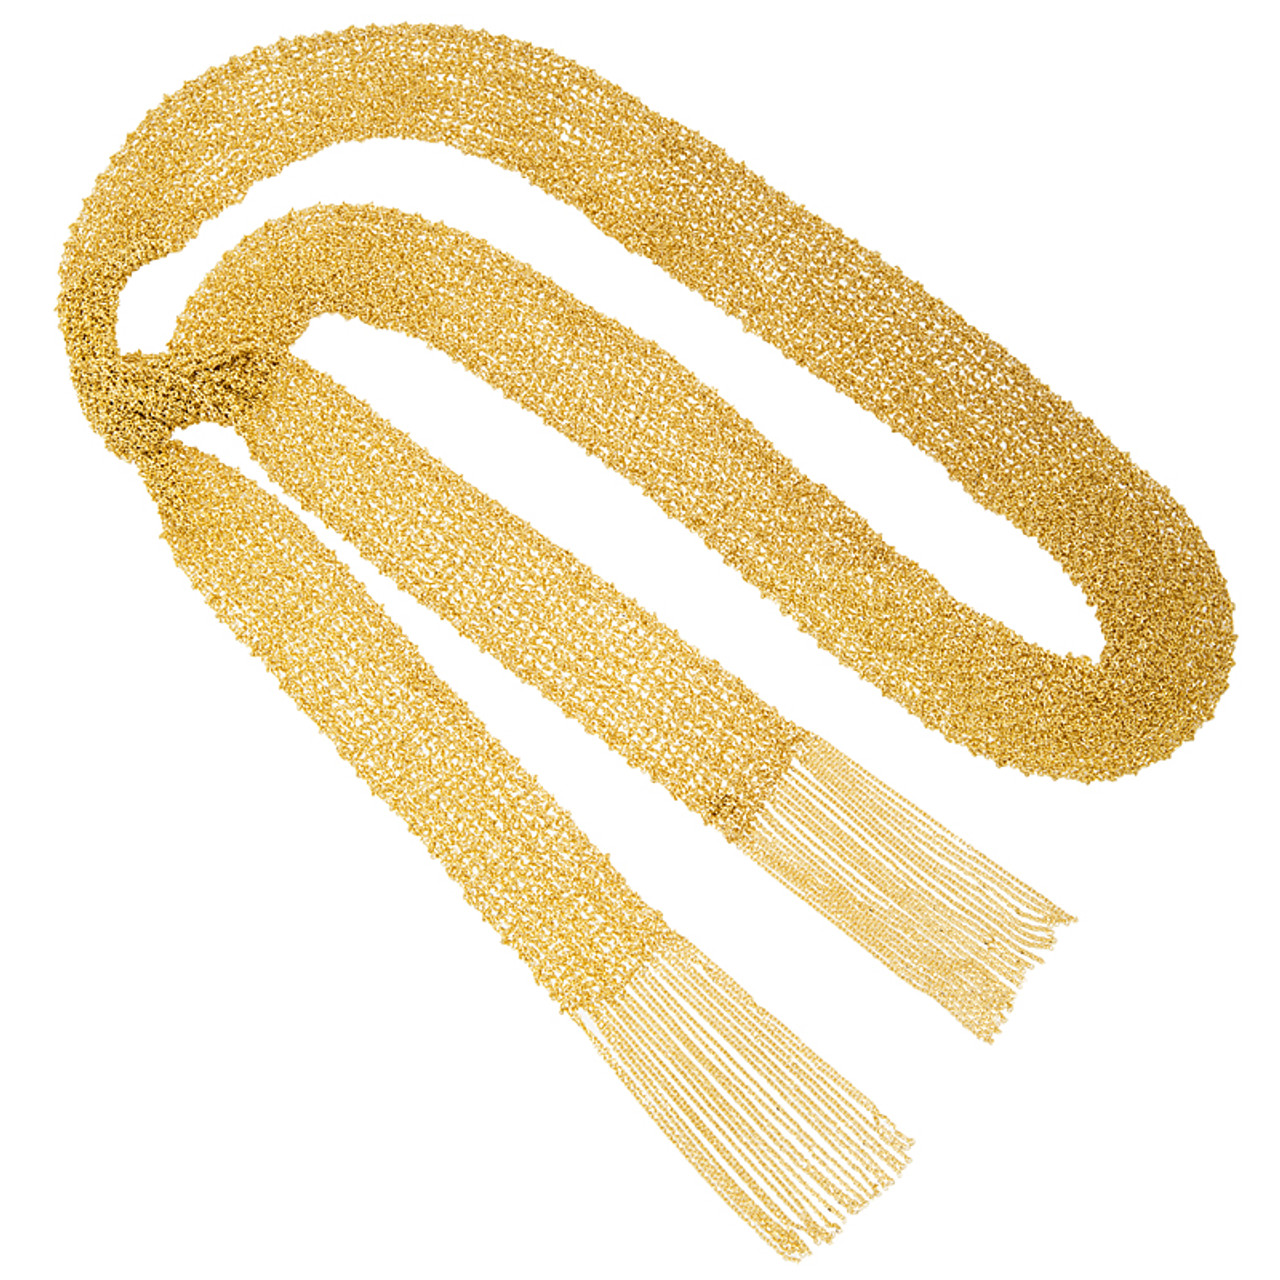 14kt Gold Mesh Scarf Necklace - Wedding Bands & Co.